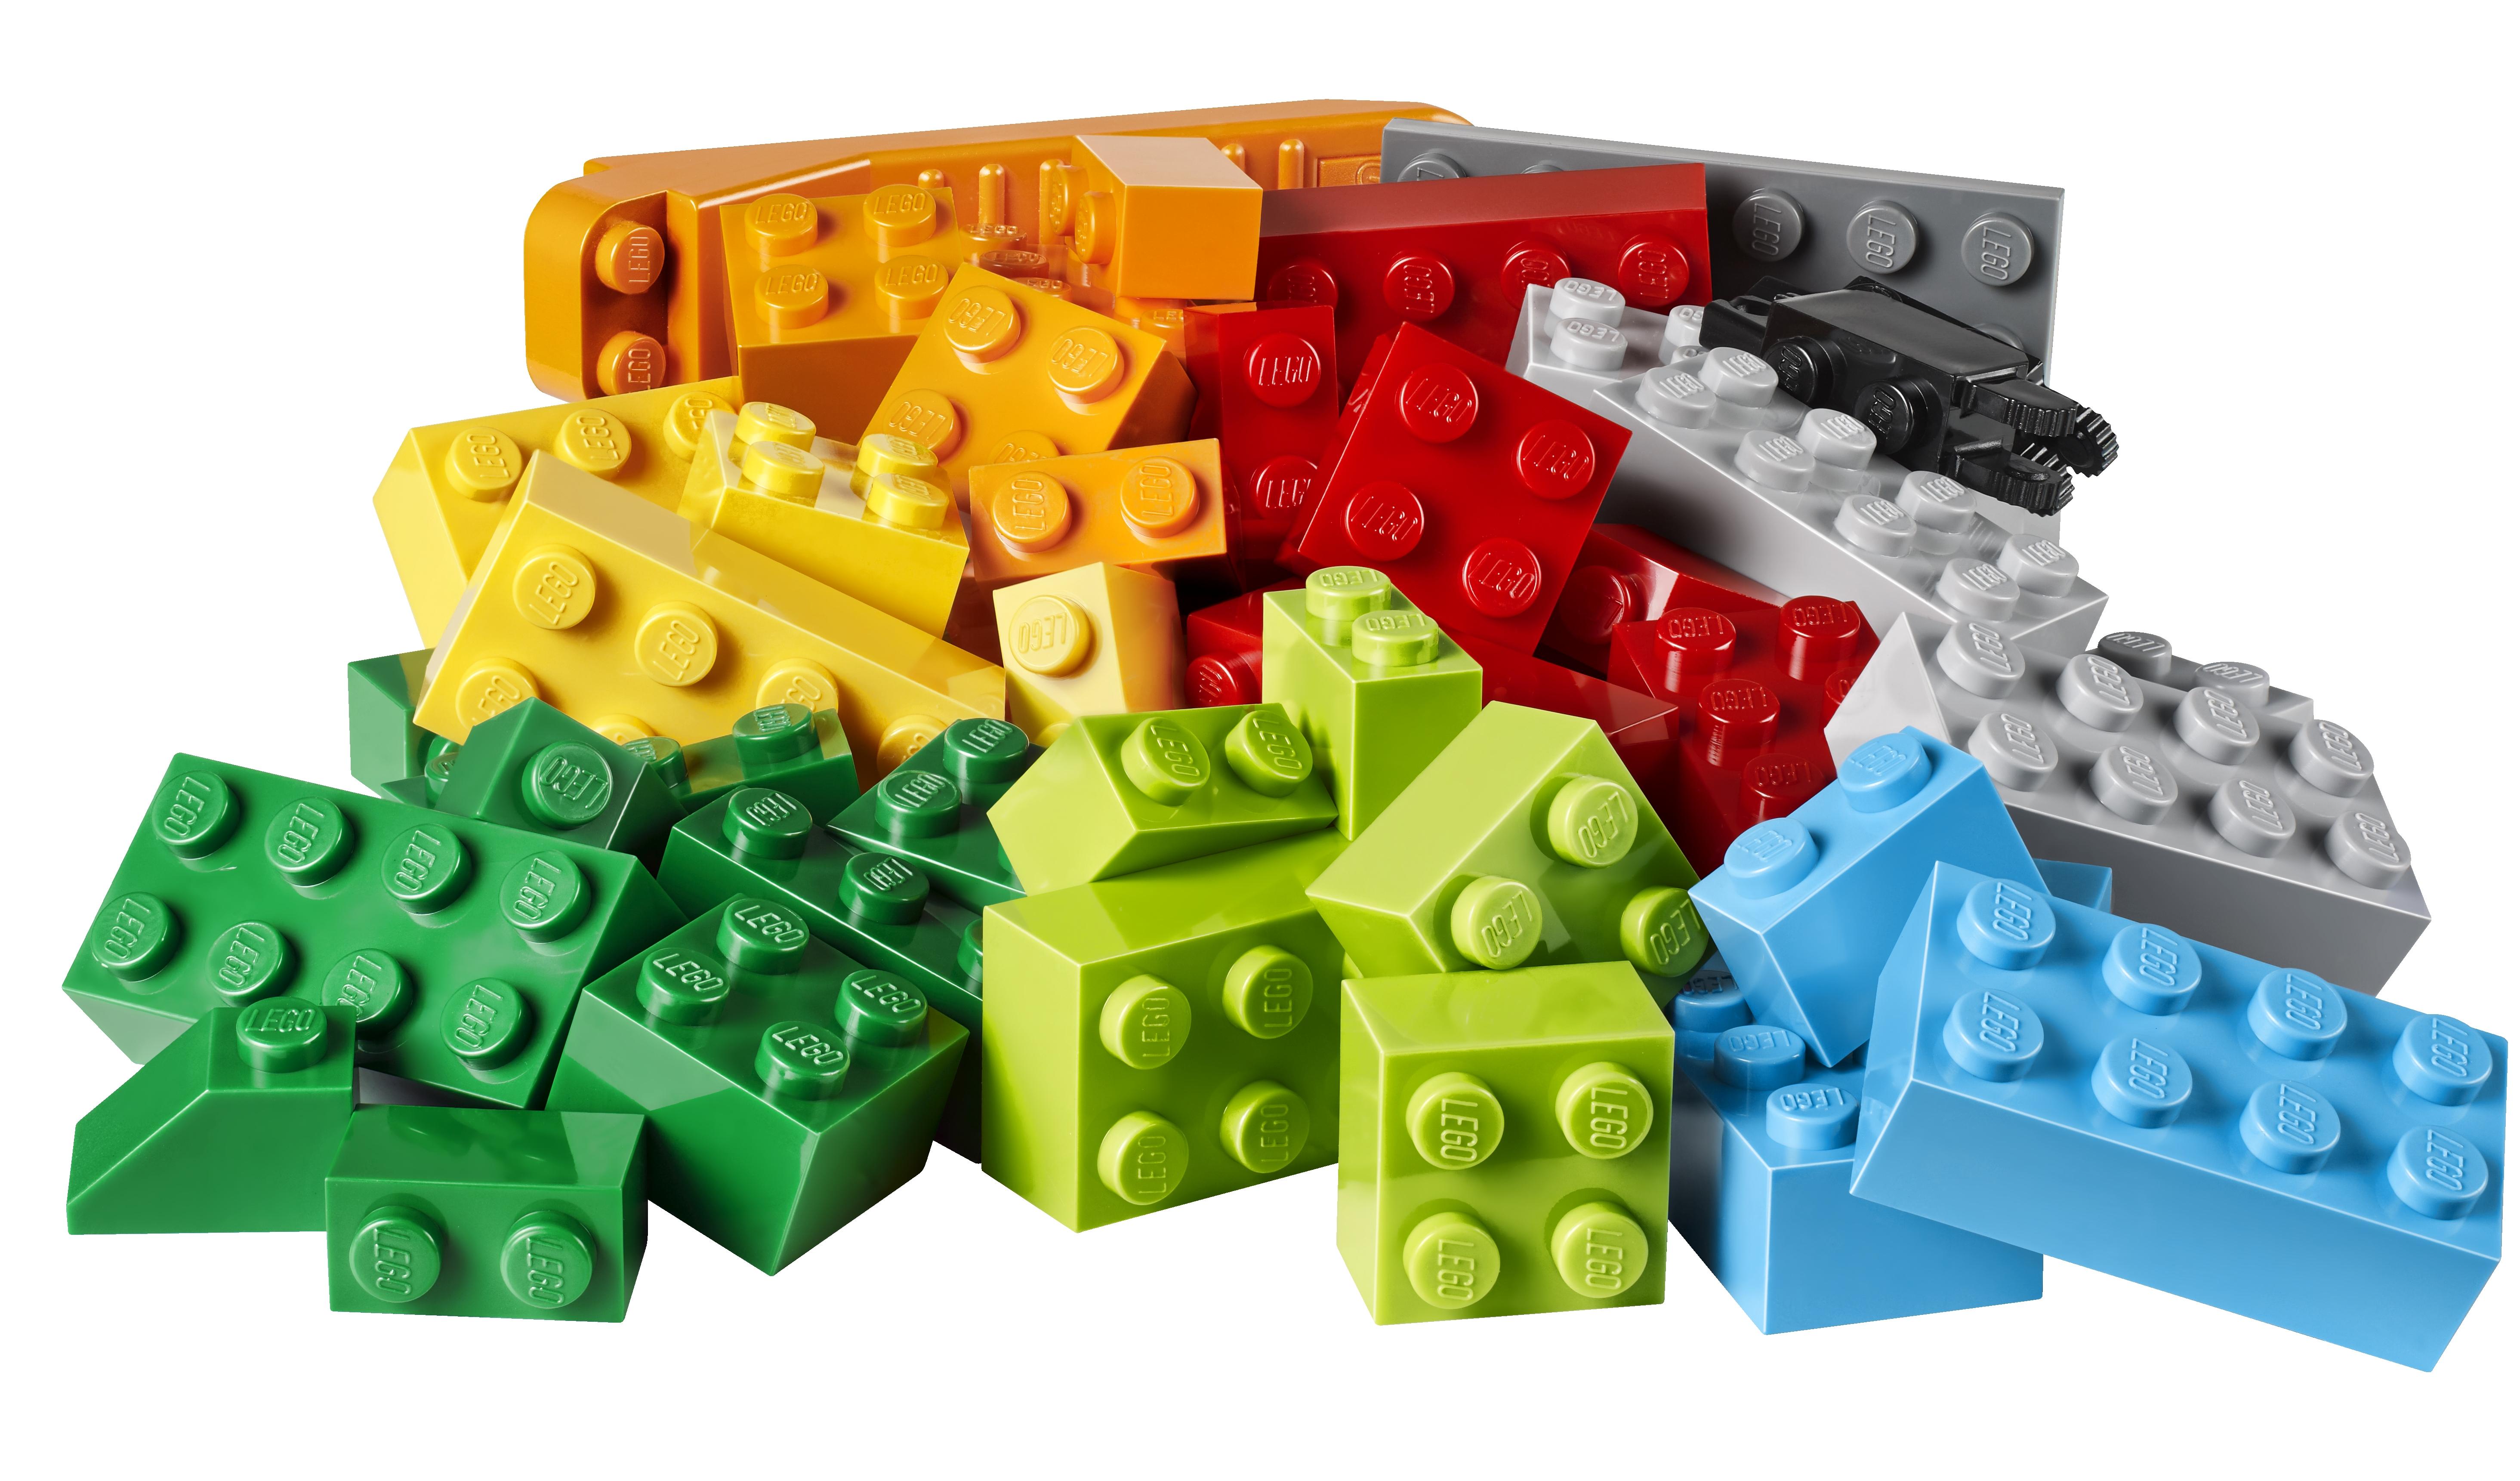 The Lego Movie: The 10 greatest individual Lego bricks ever made ...